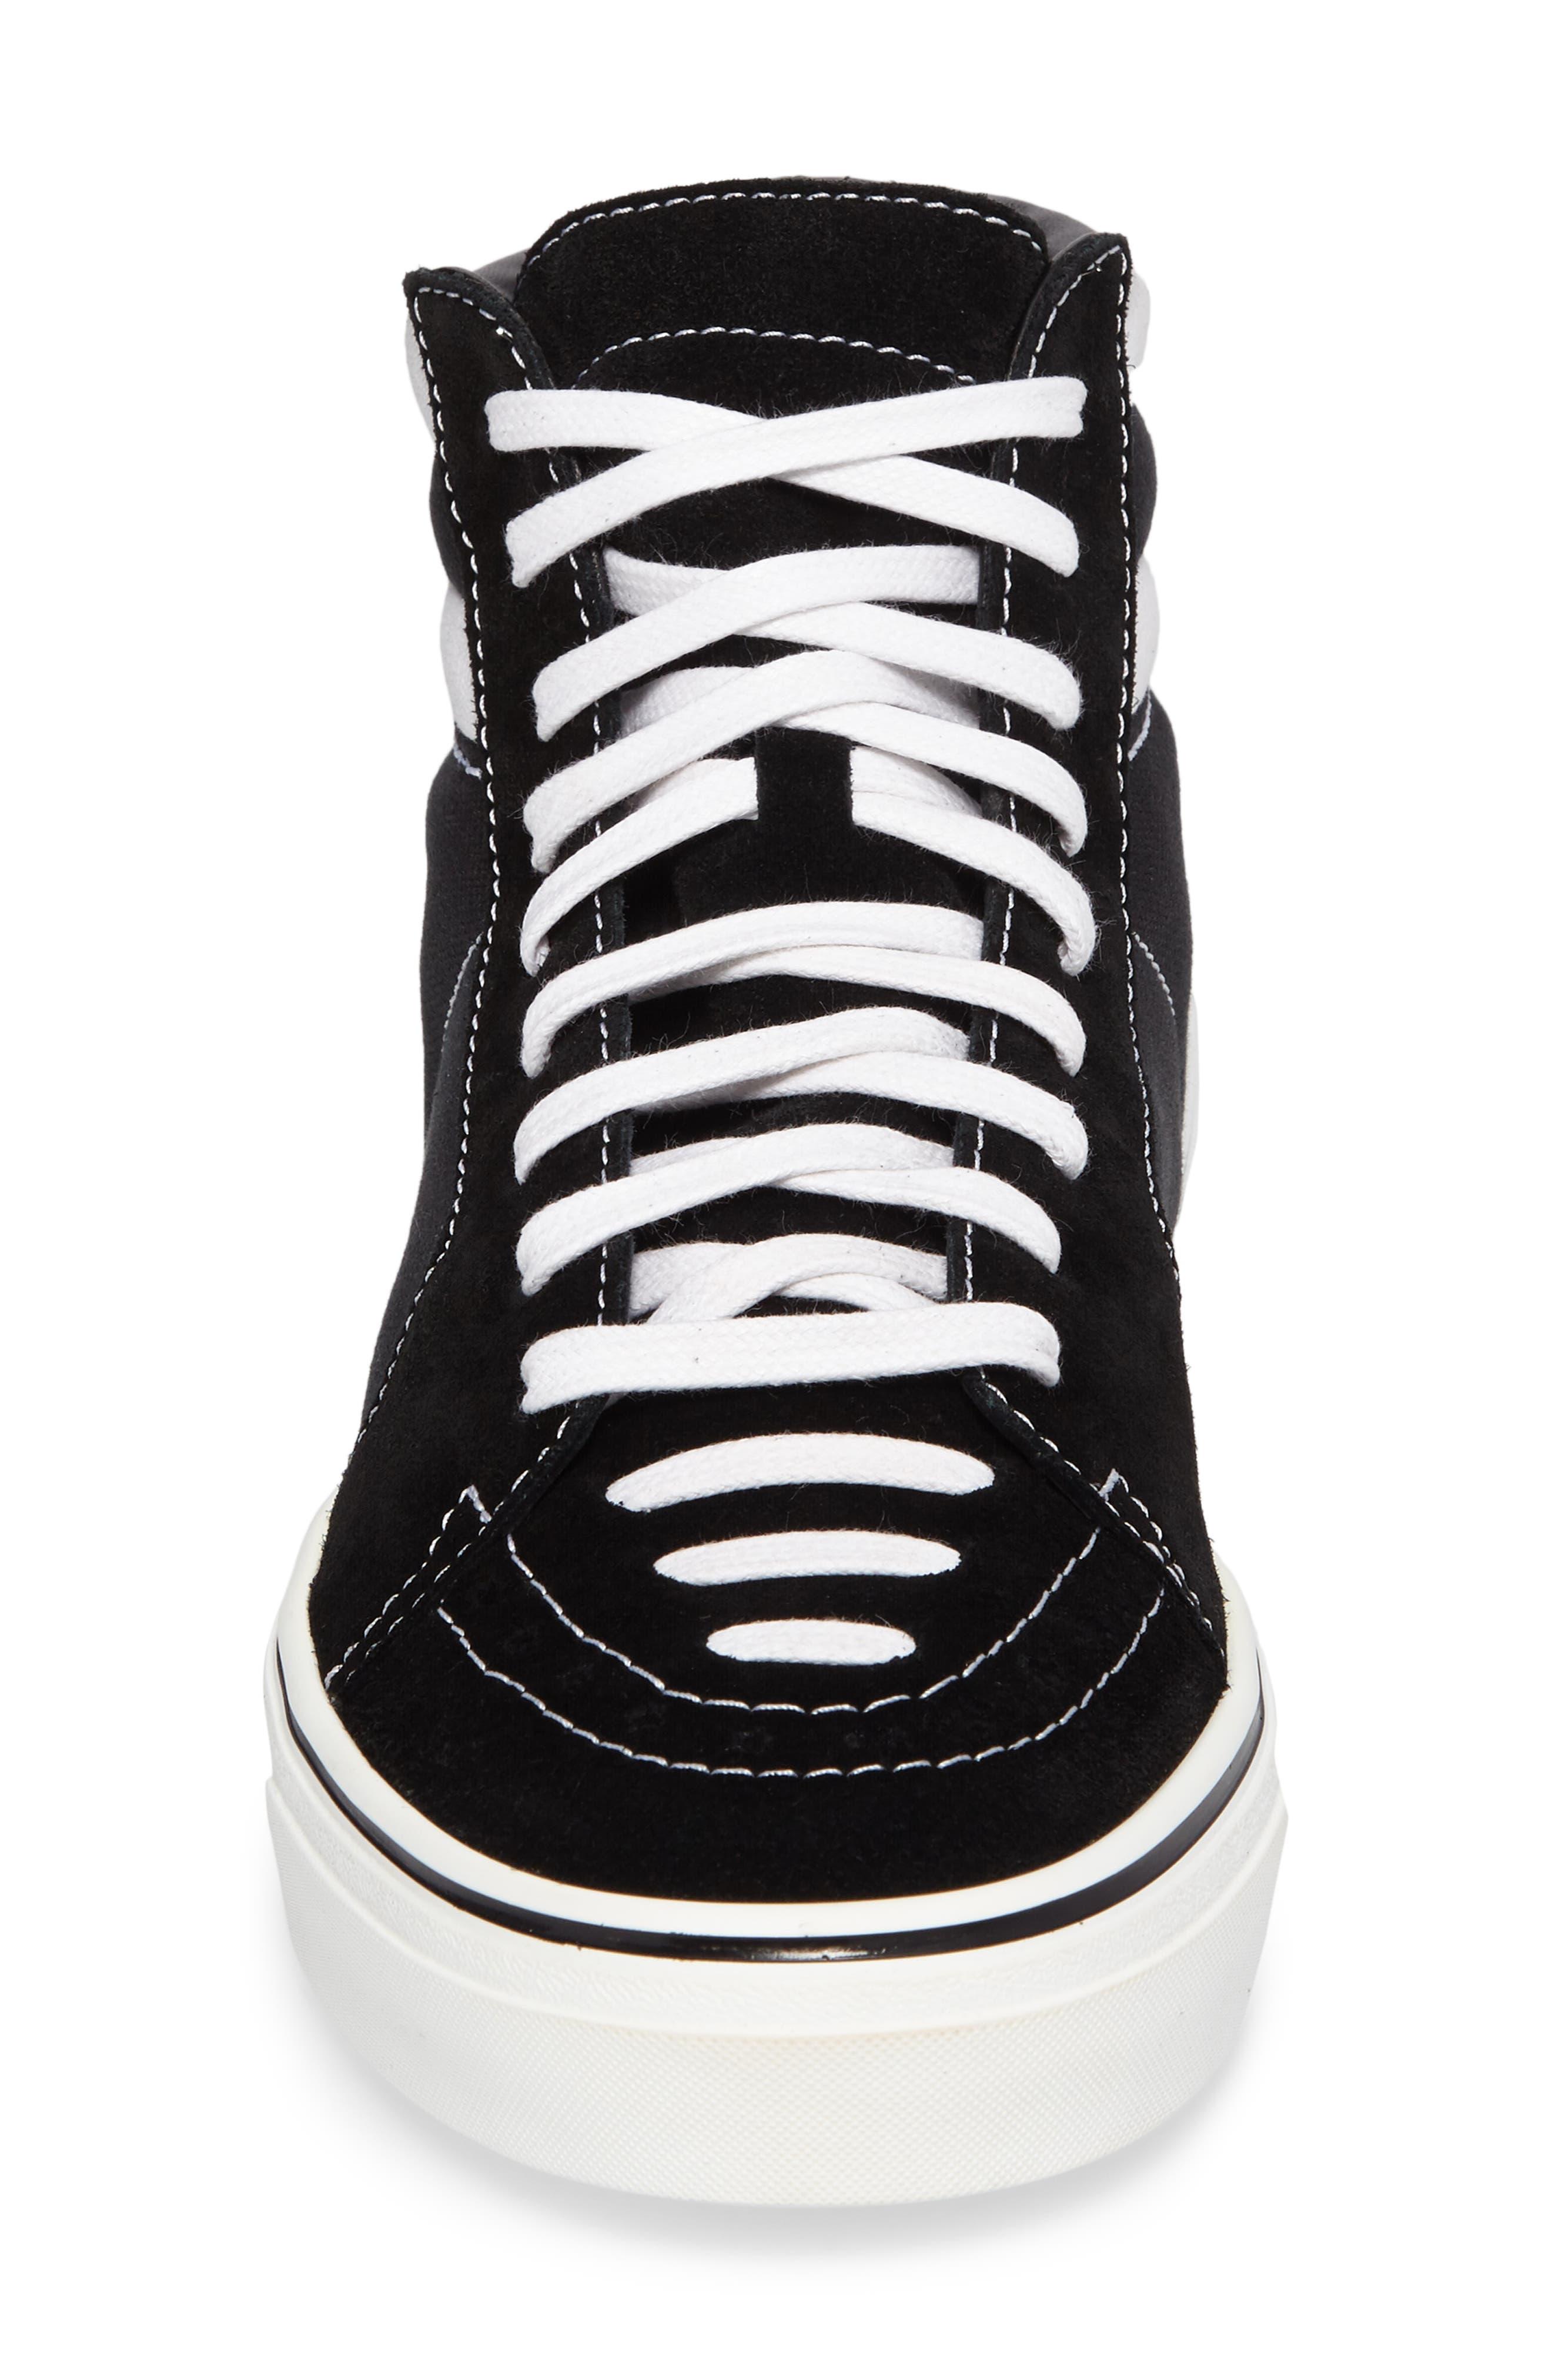 High Top Sneaker,                             Alternate thumbnail 4, color,                             004